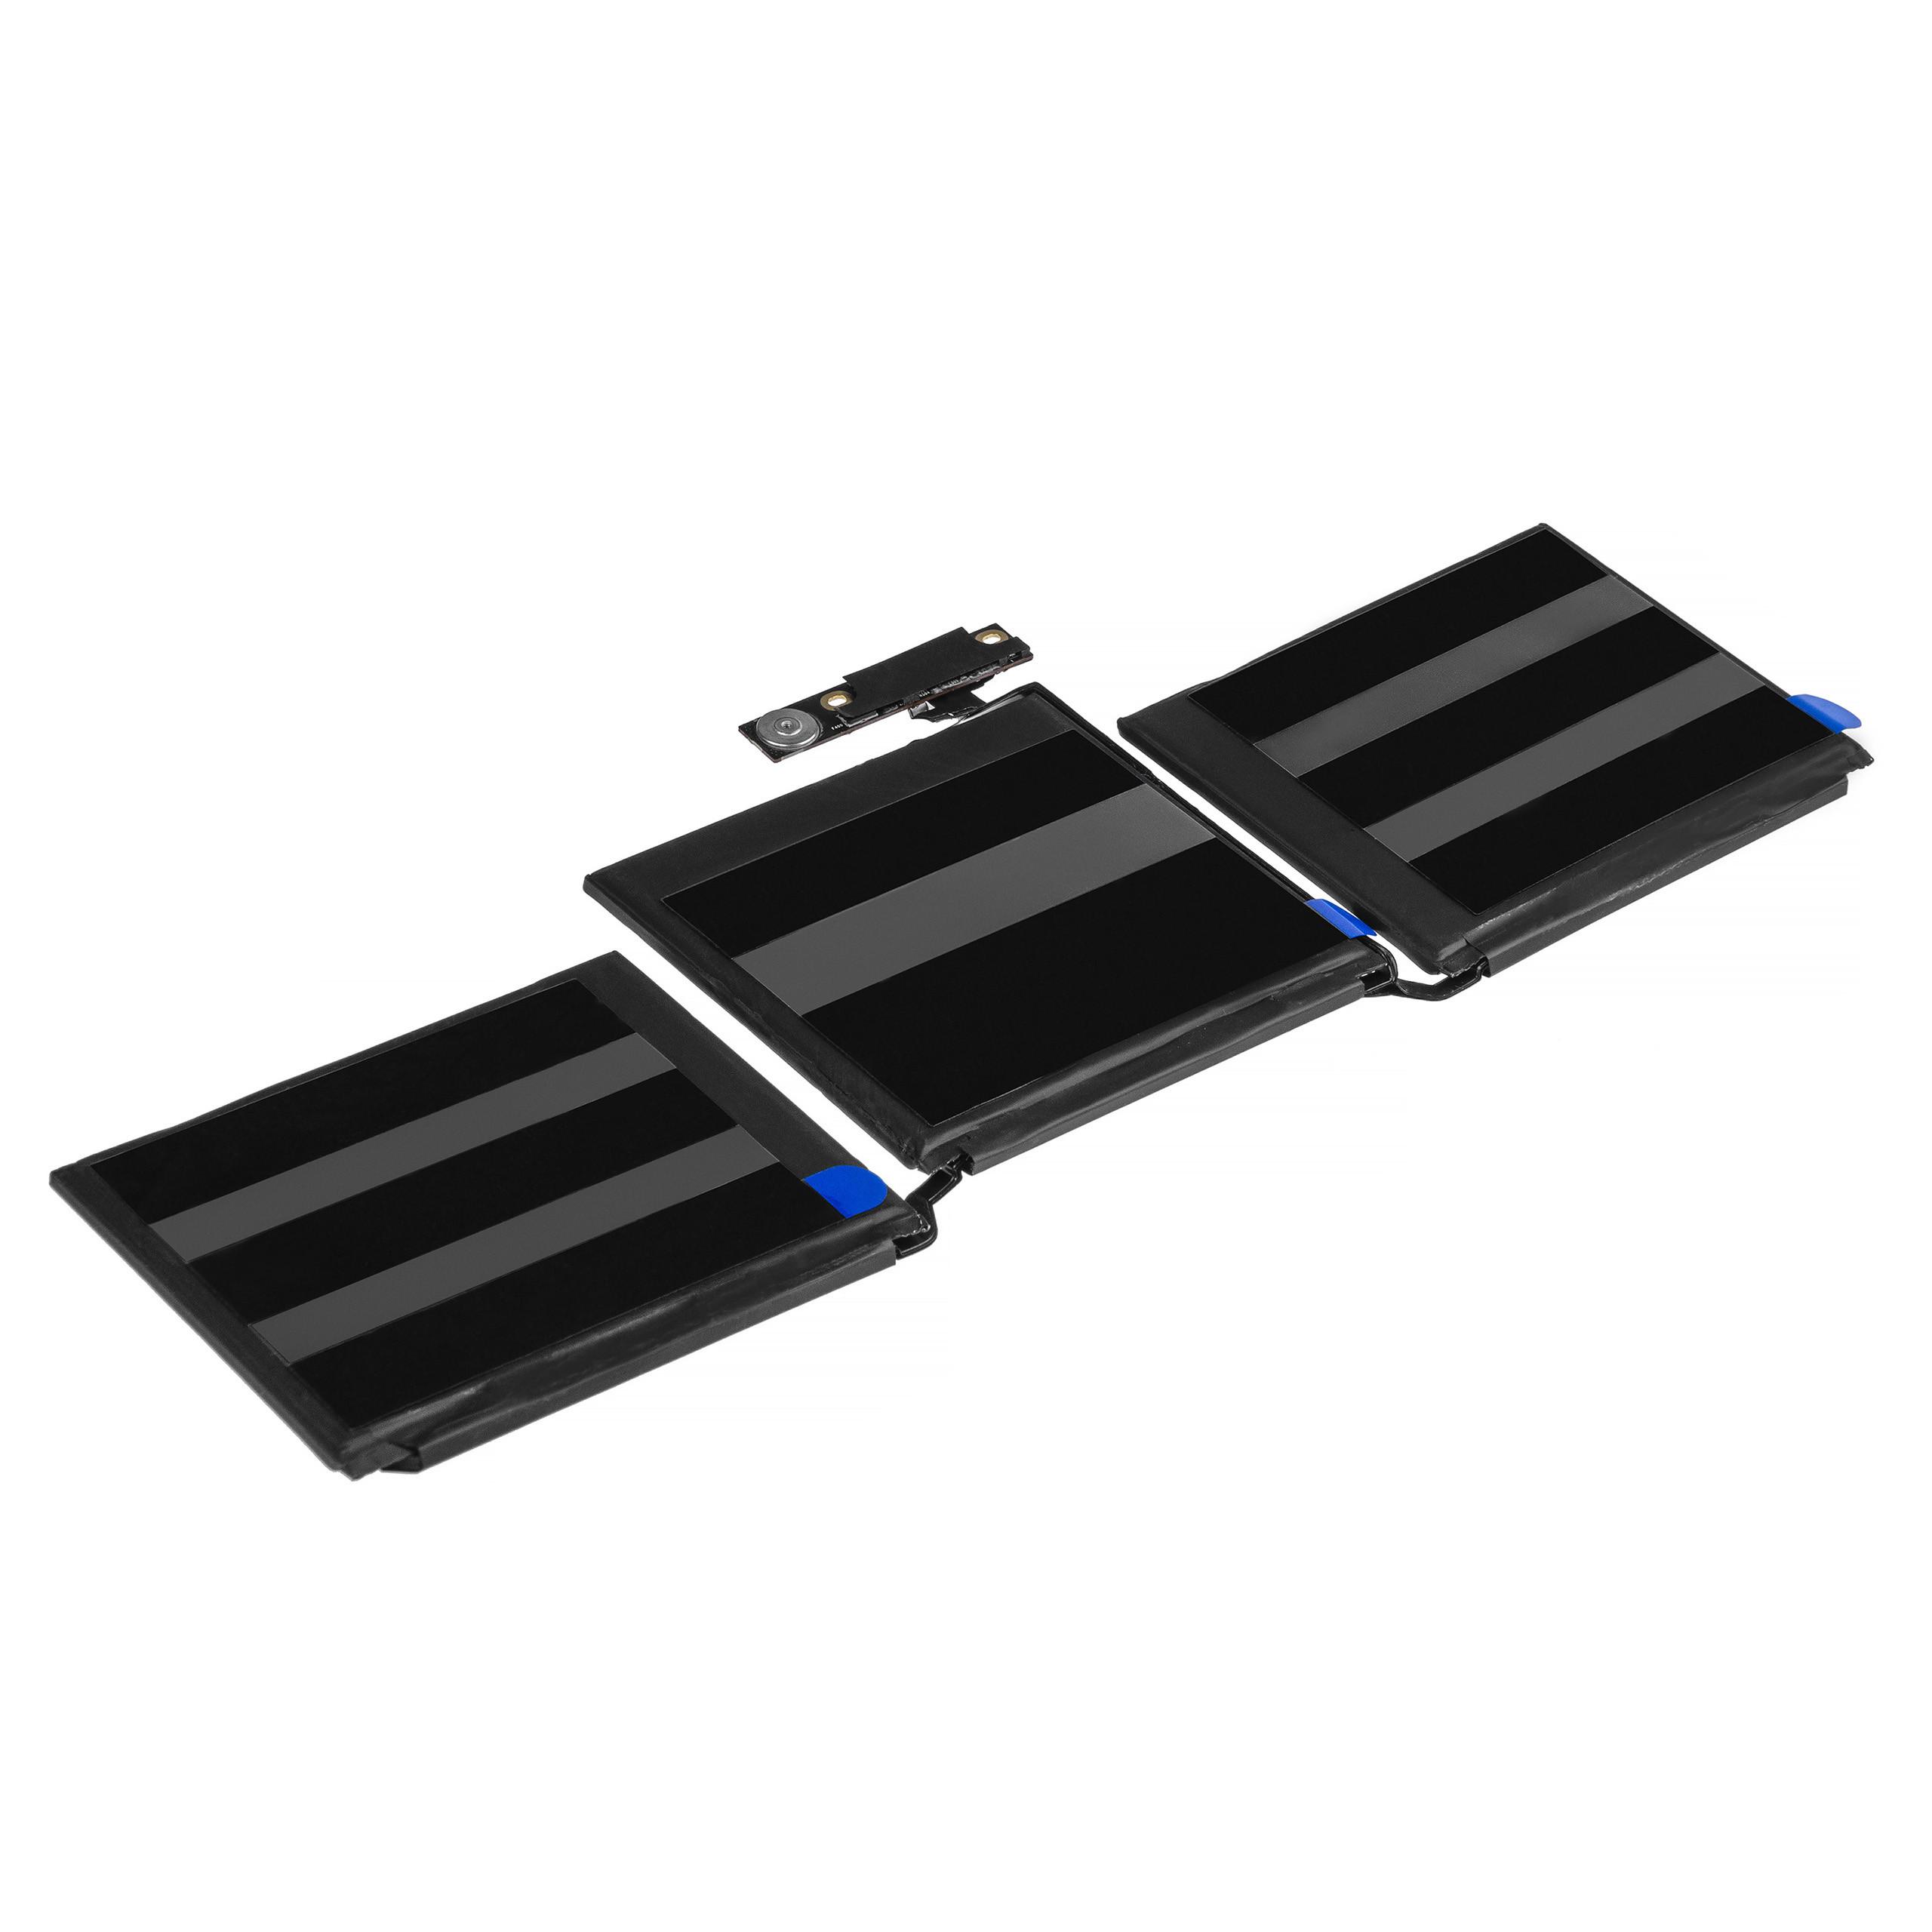 Green Cell A1713 Baterie Apple A1713,Apple MacBook Pro 13 A1708 (2016 i 2017, 2 porty thunderbolt) 54,5Wh Li-Pol – neoriginální